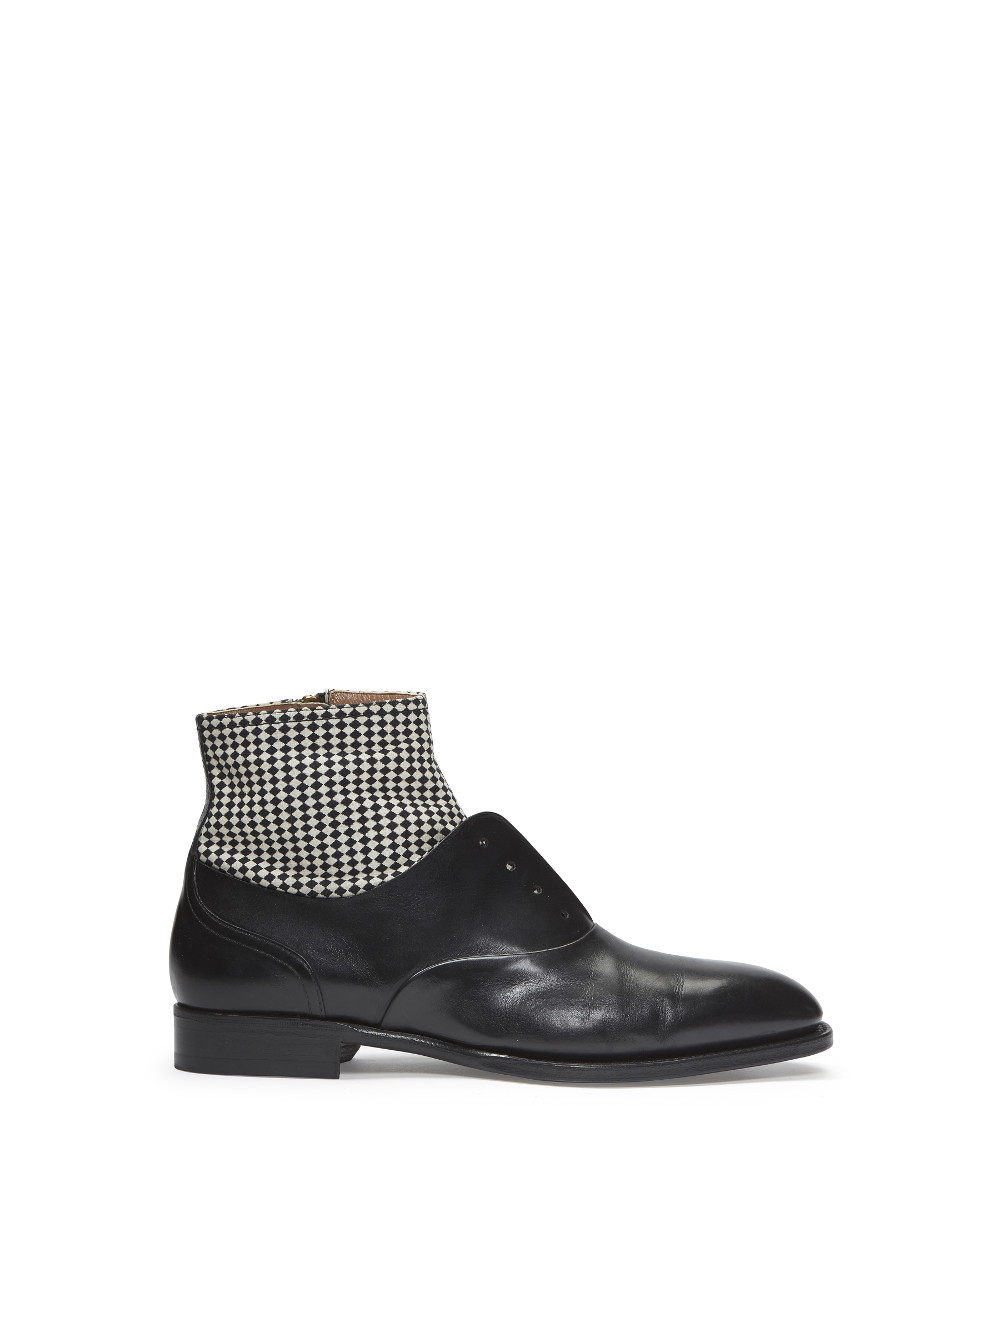 Chaussures Nikolai - Laurence Dacade